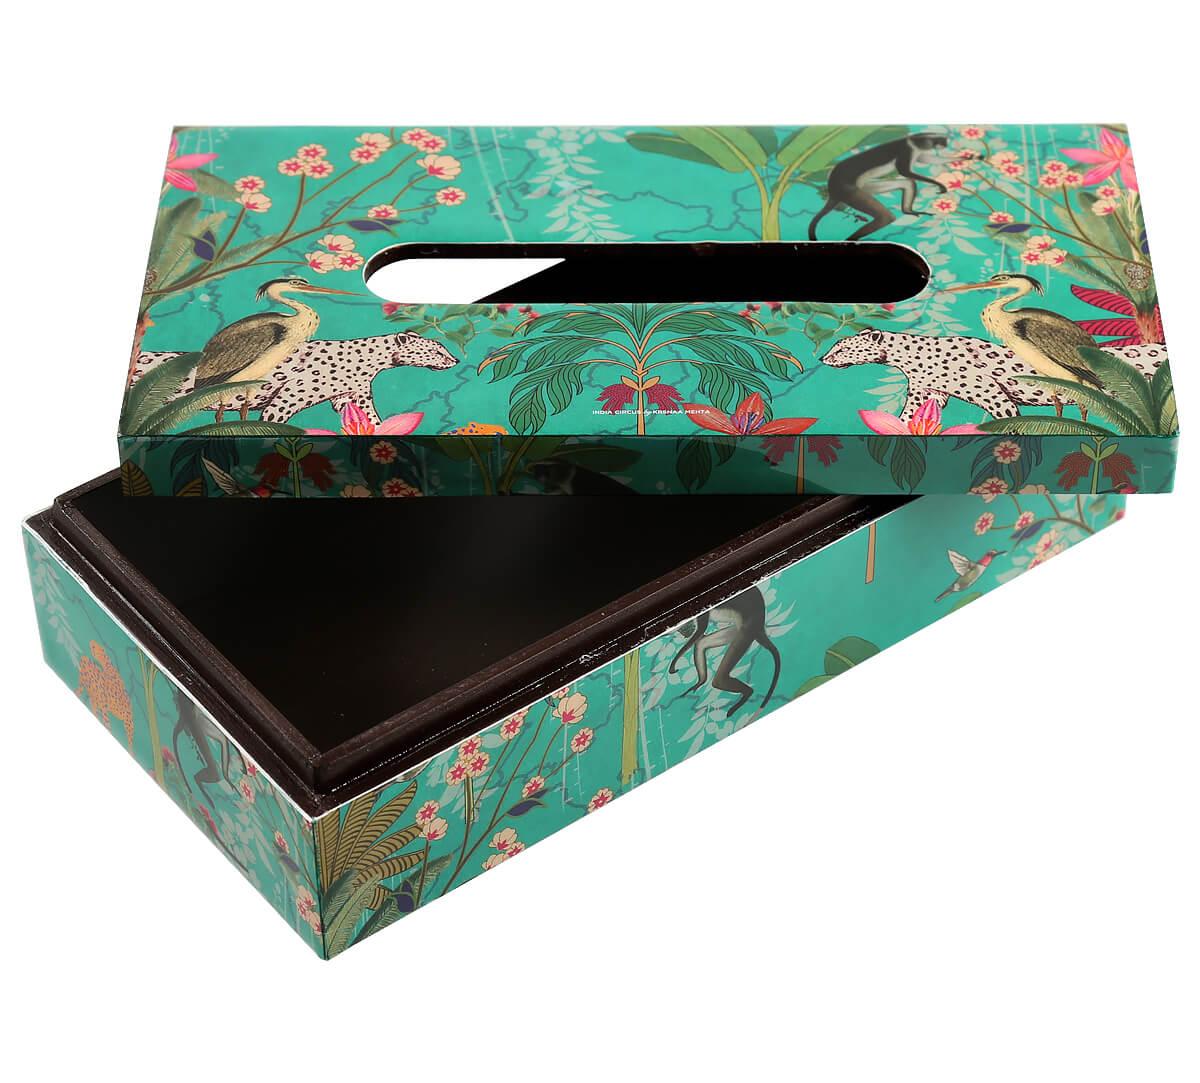 Animal Kingdom Tissue Box Holder